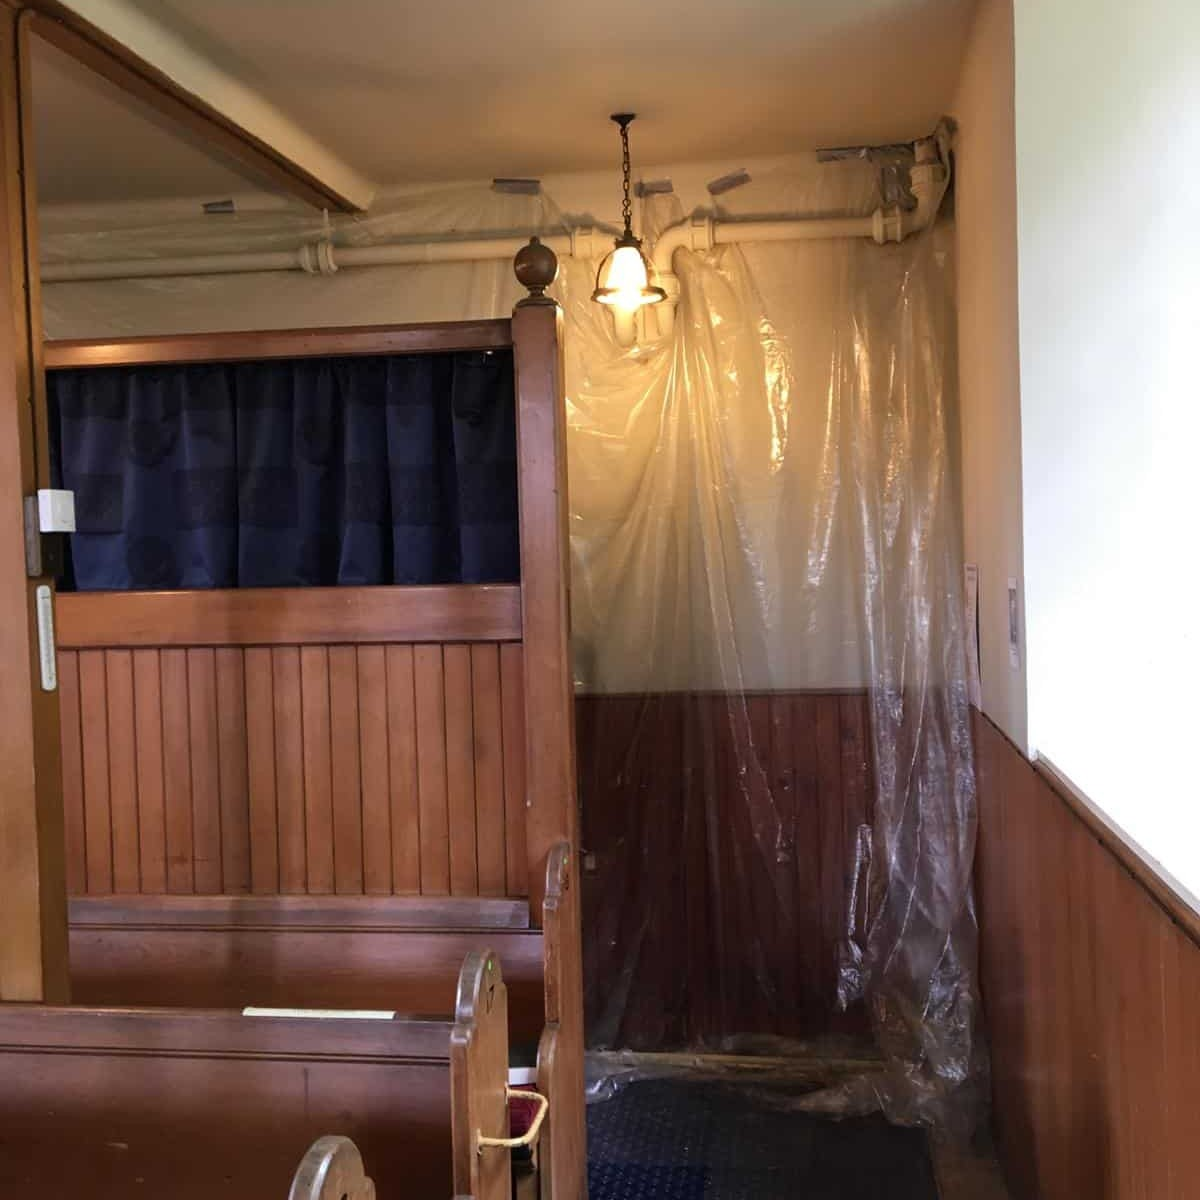 Photos from Bishopton Parish Church heating system 14